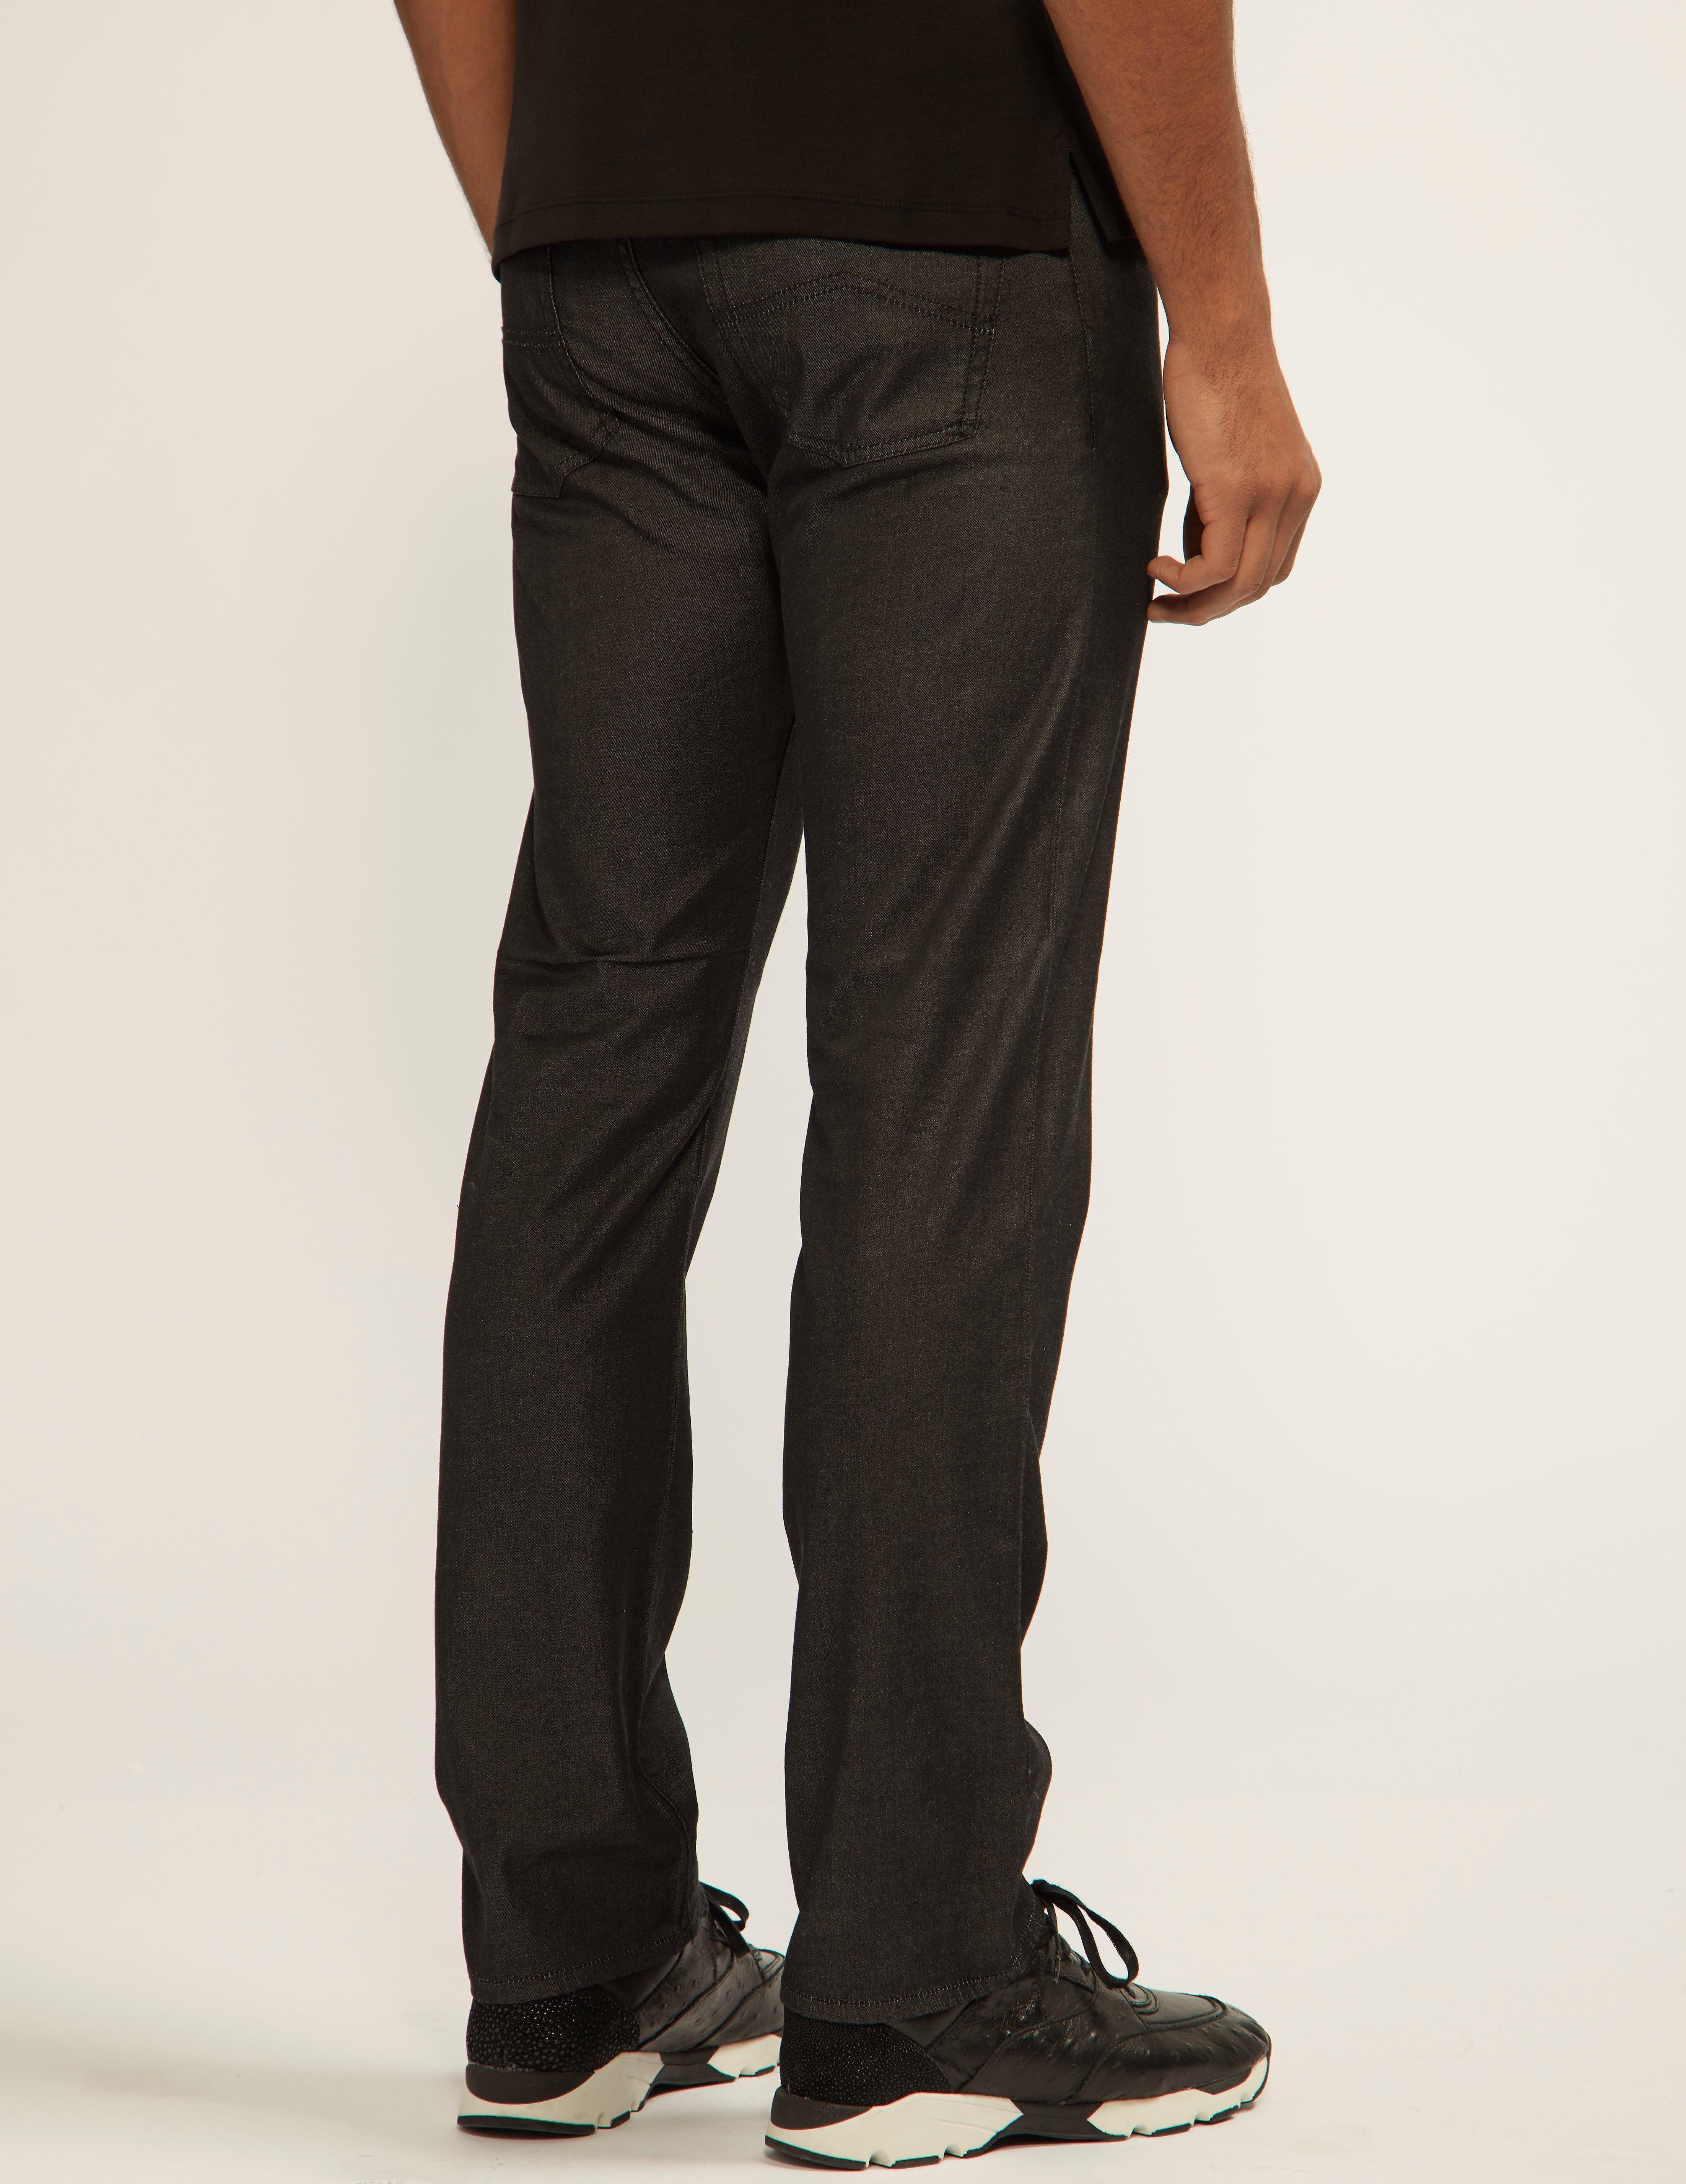 Armani Jeans J21 Ton Comfort Fit Jeans - Long Leg